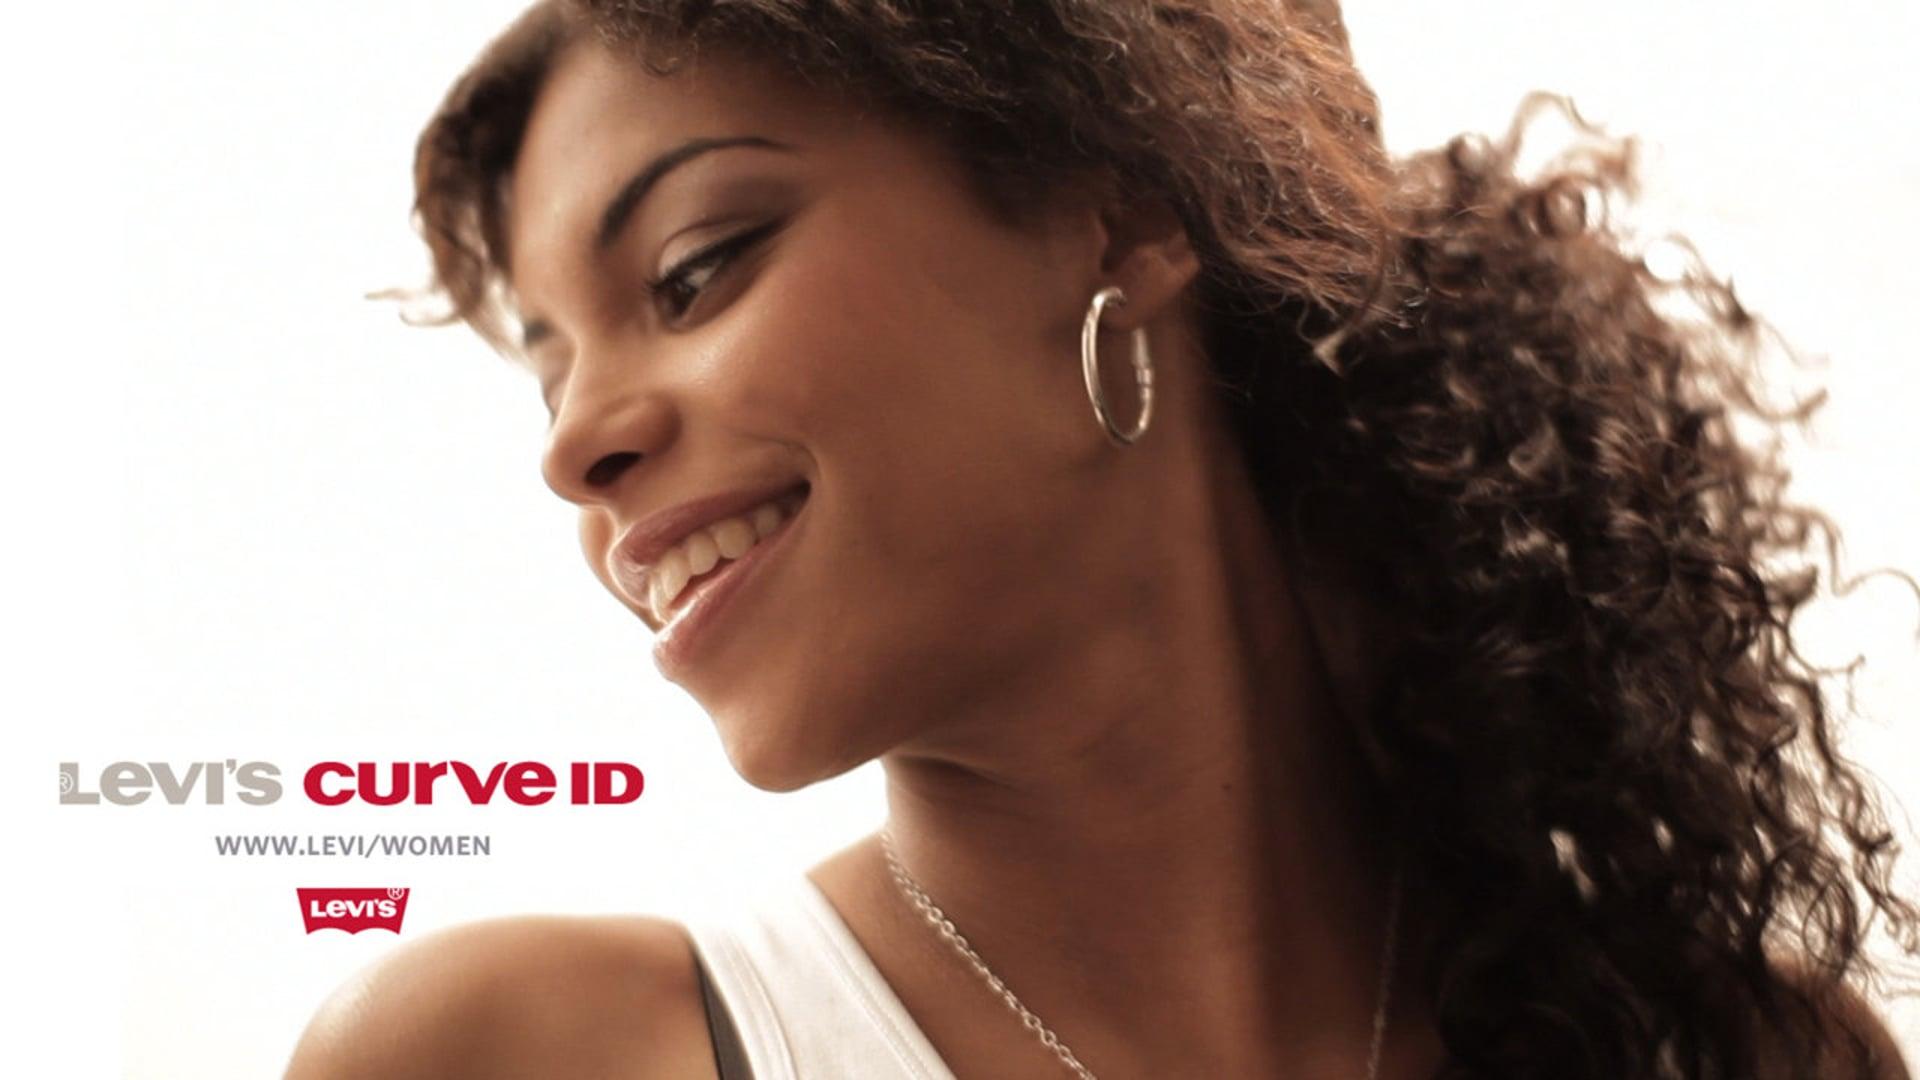 Levi's Curve ID Branding Video